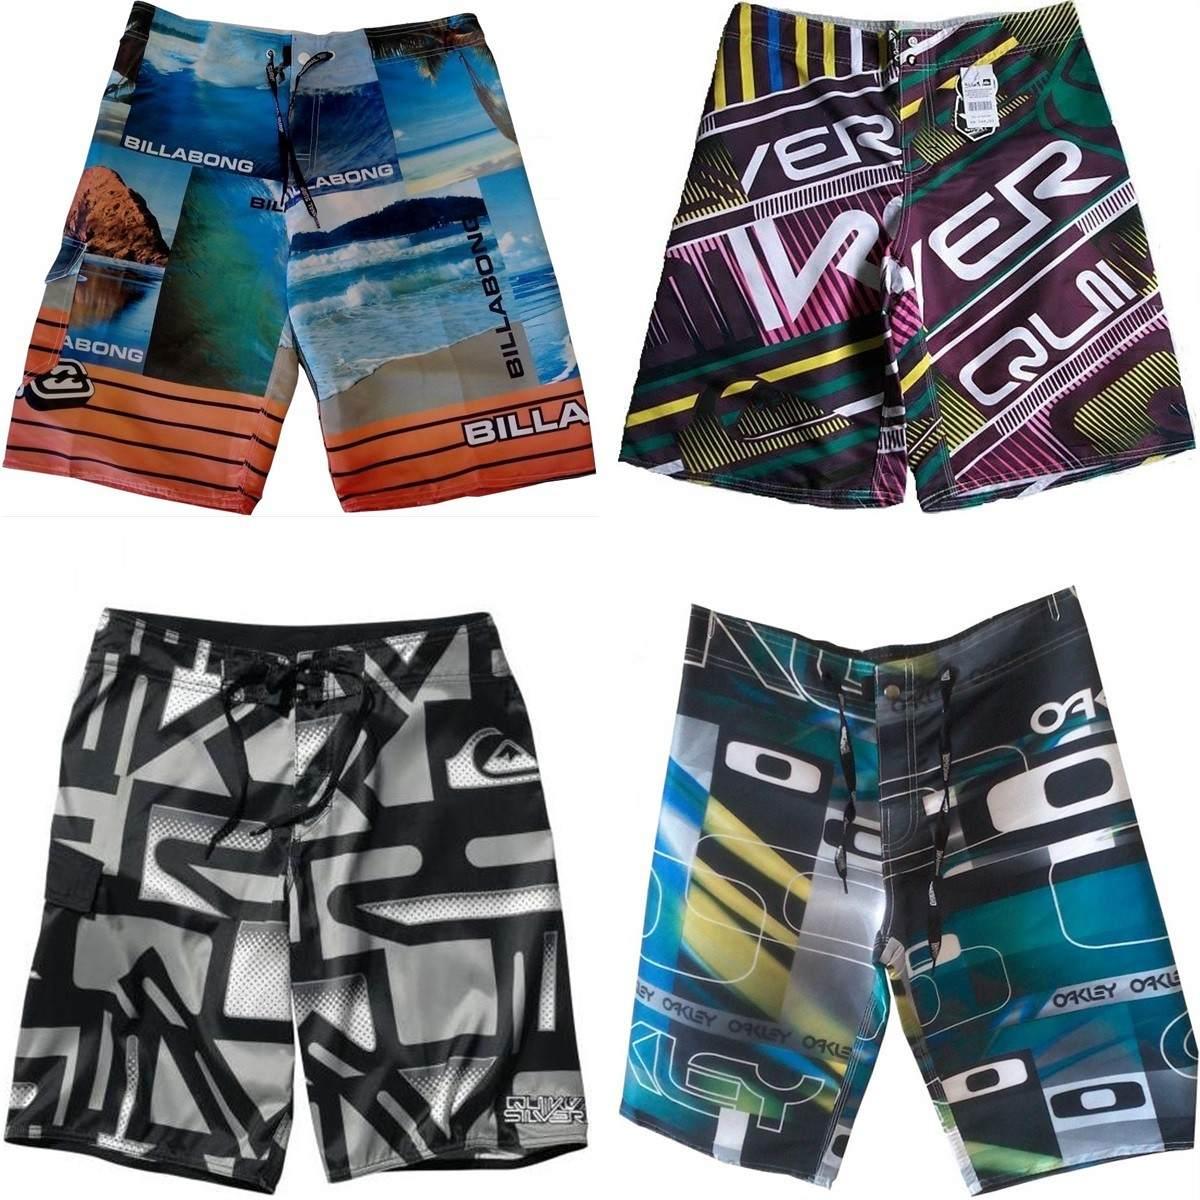 Kit 20 Bermuda Shorts Tactel Surf Praia 36 Á 52 - R  334 1305ec174a2